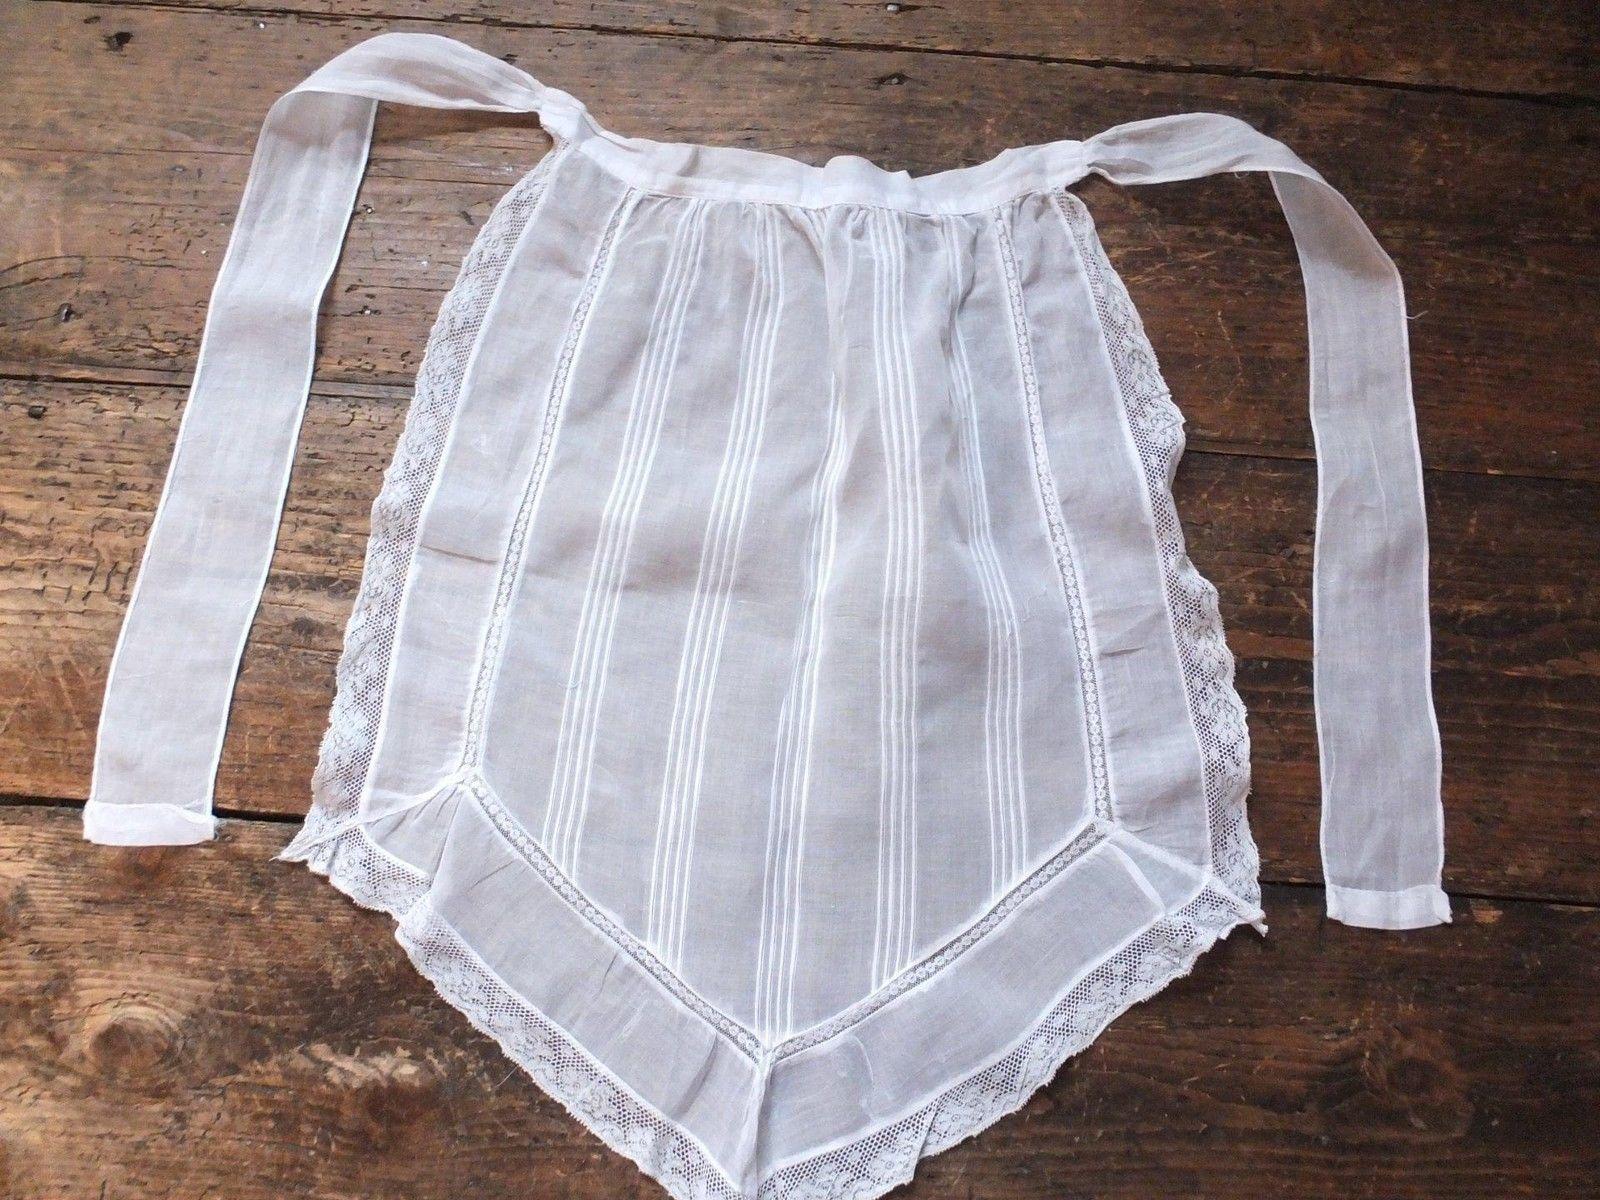 White lace apron ebay - Vintage C1920 S Maid Or Waitress Apron Brilliant White Lace Edged Theatre Etc Ebay